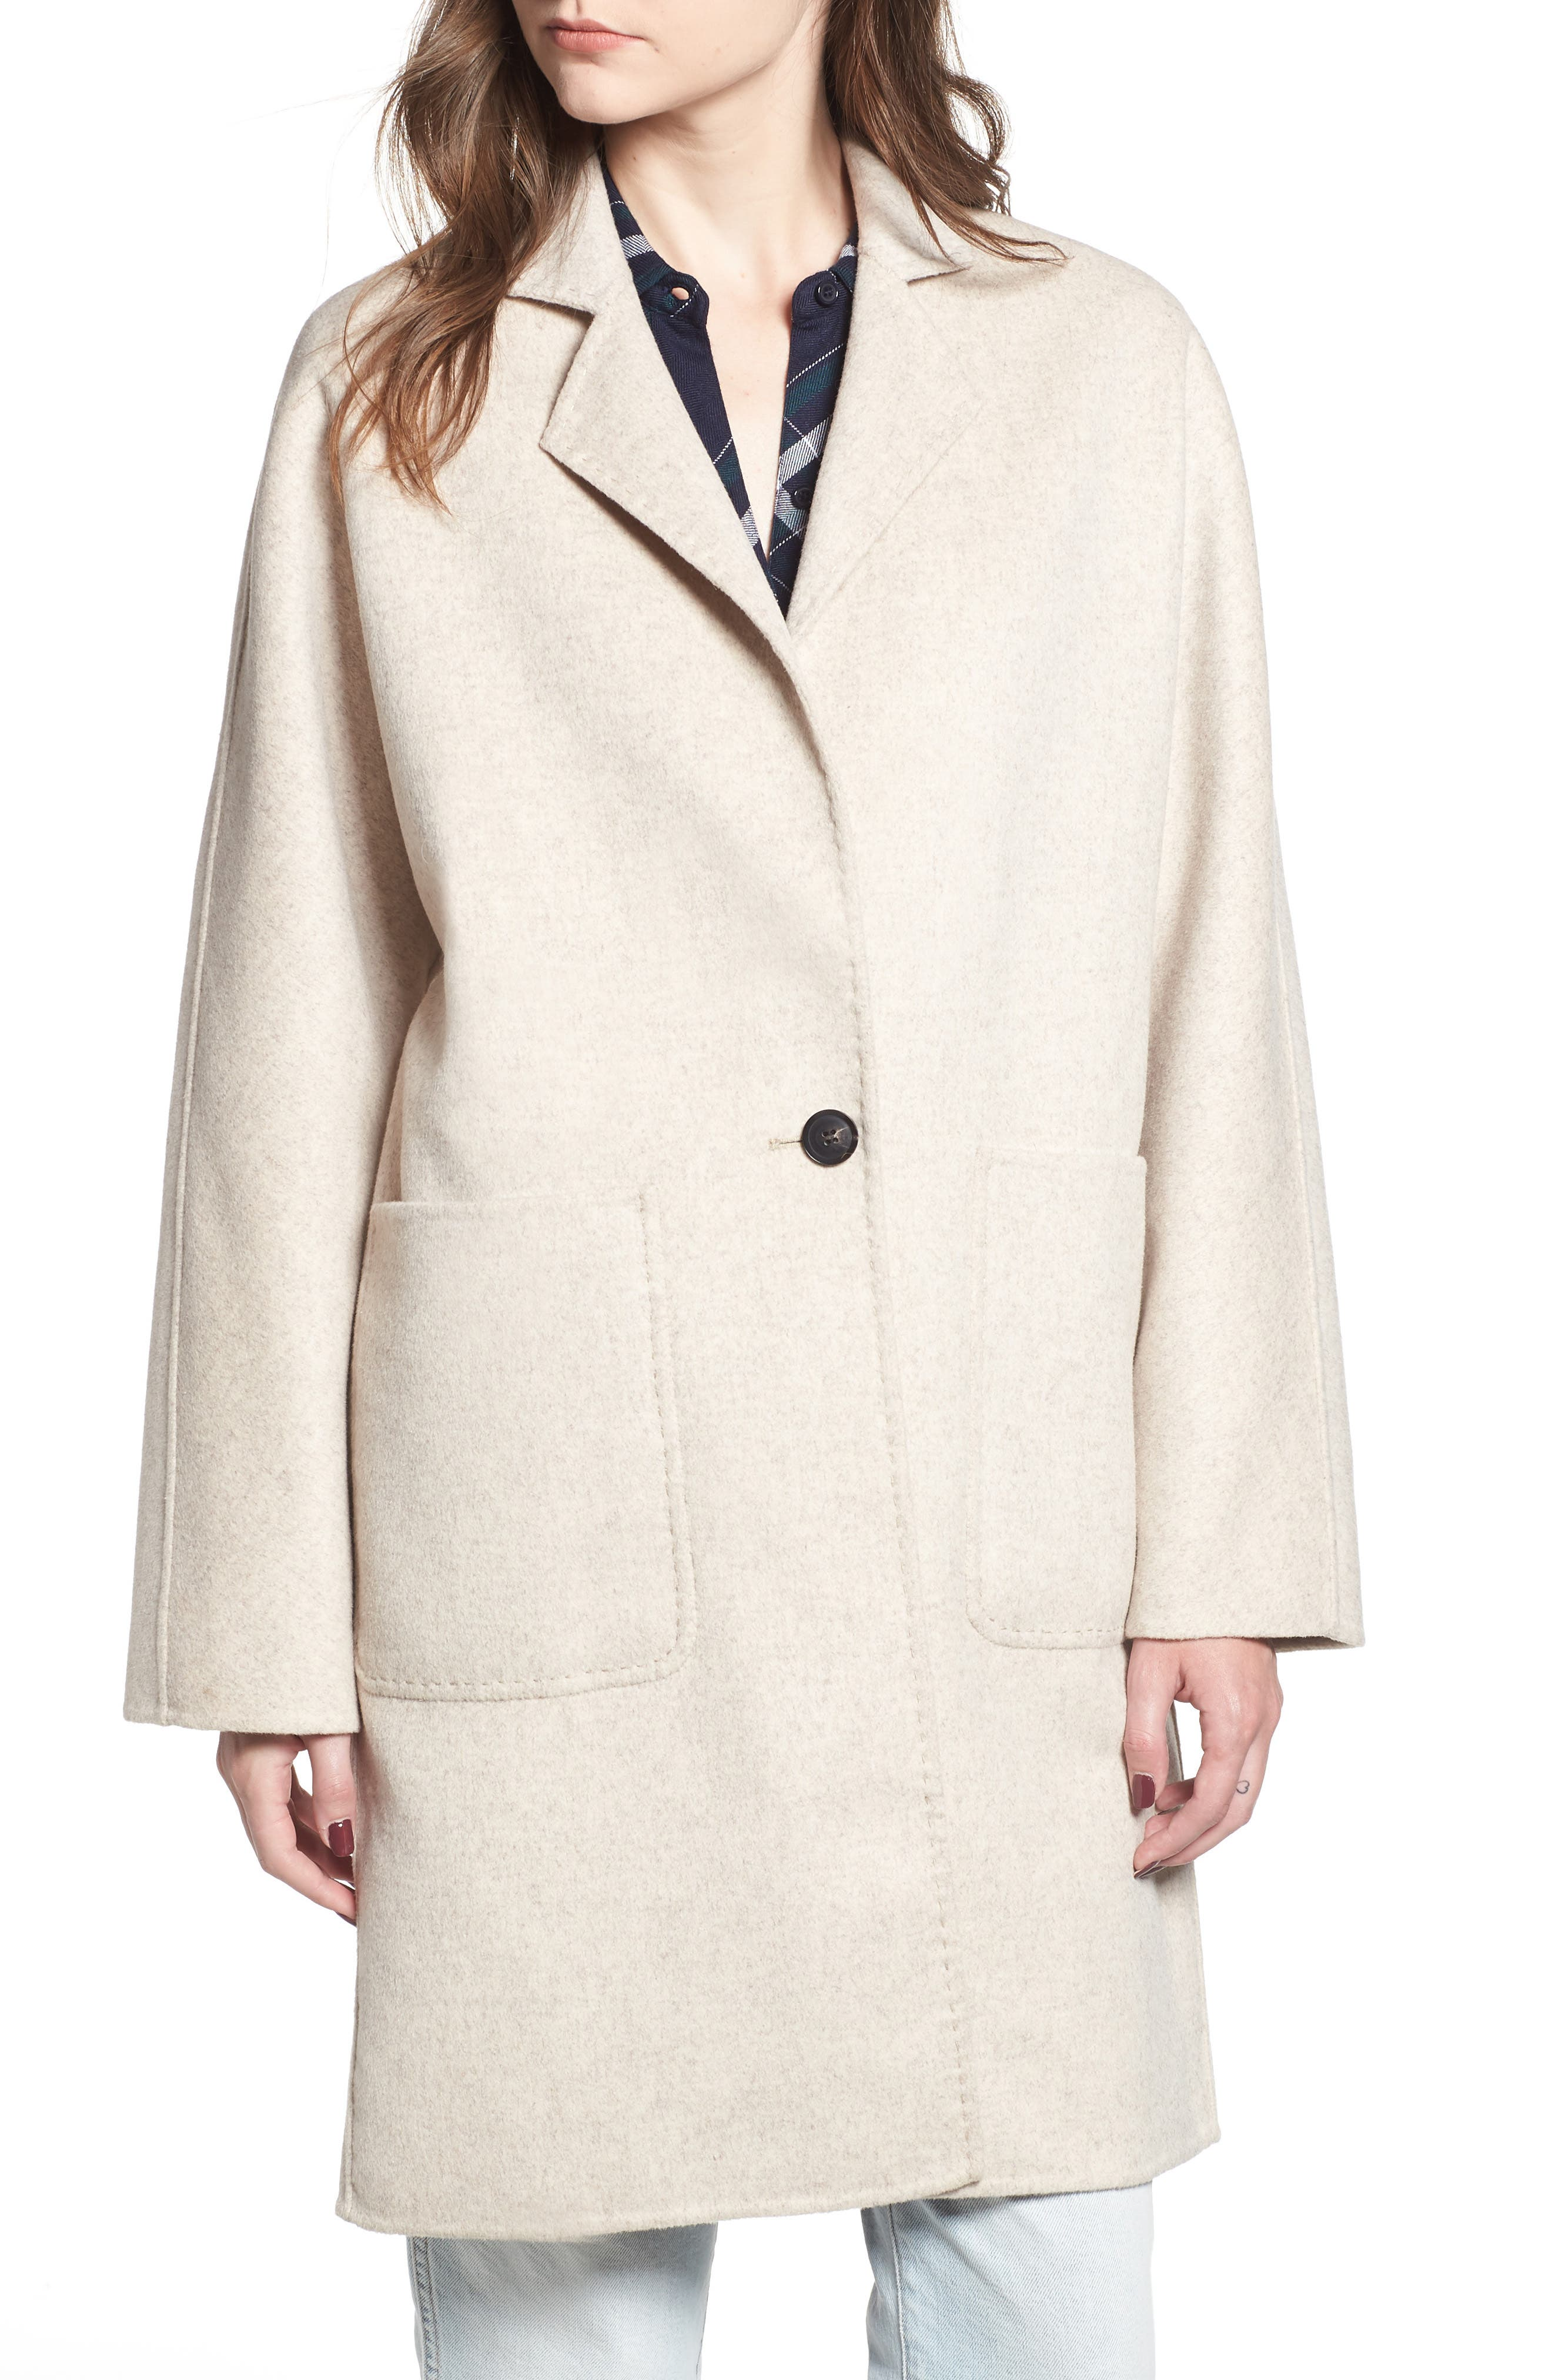 Everest Wool Blend Coat,                             Alternate thumbnail 6, color,                             OATMEAL